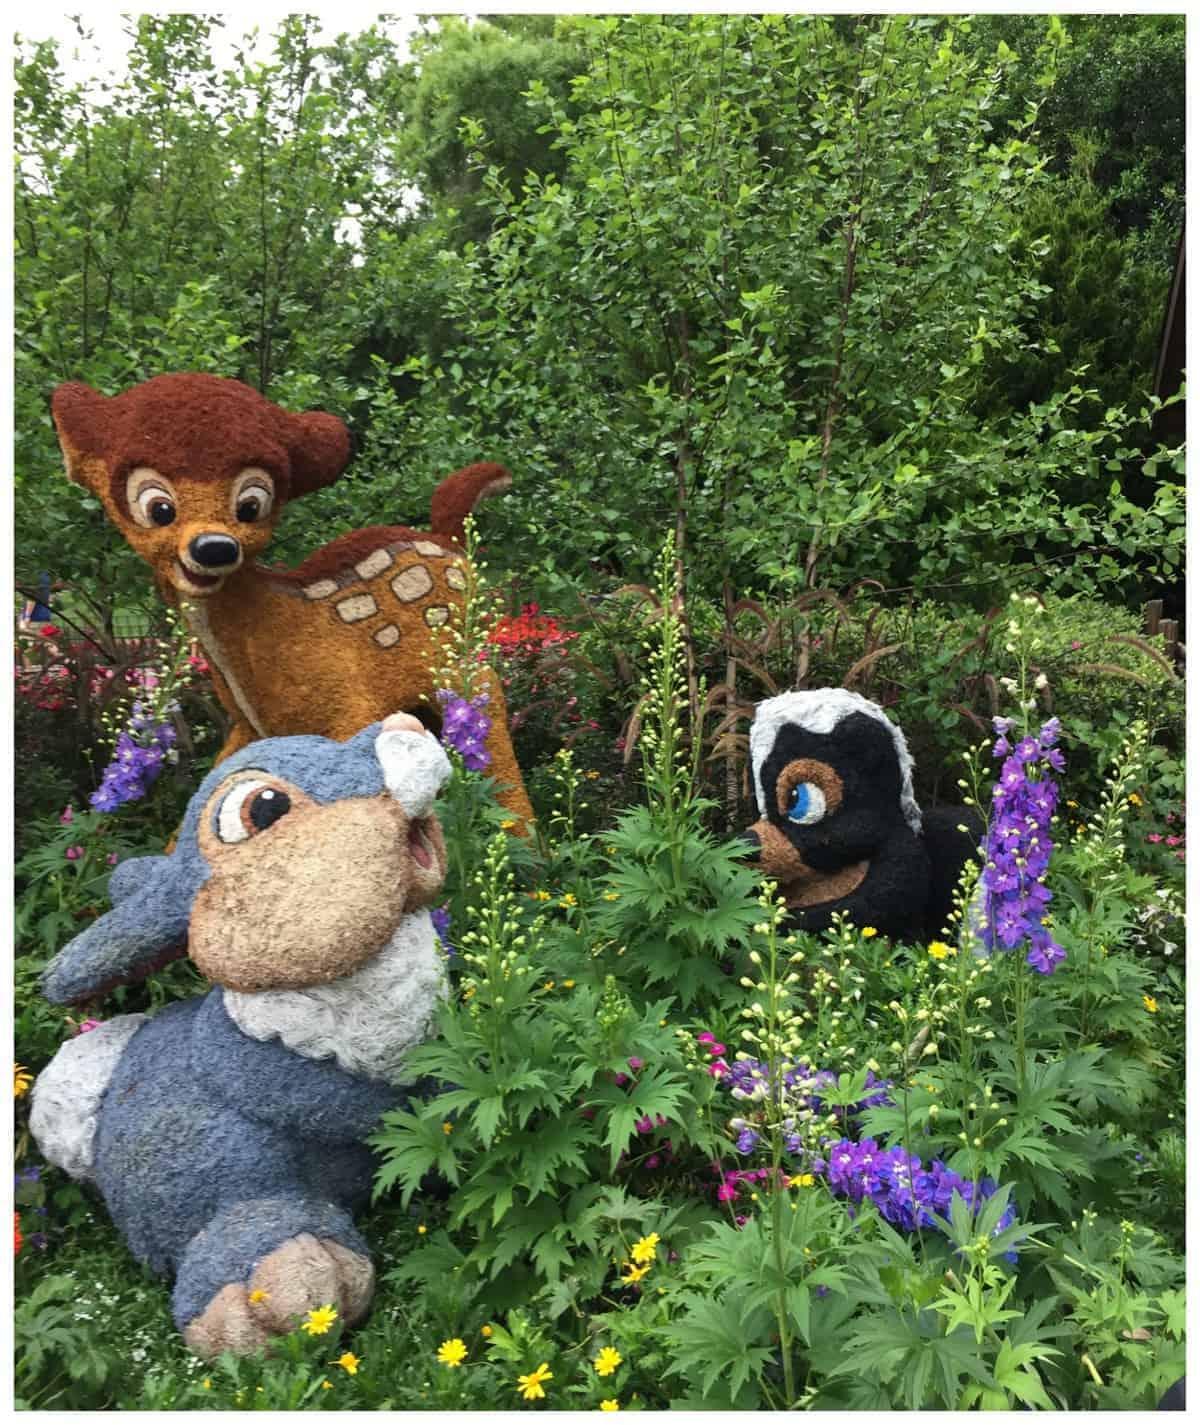 Epcot's International Flower & Garden Festival #MonkeyKingdomEvent